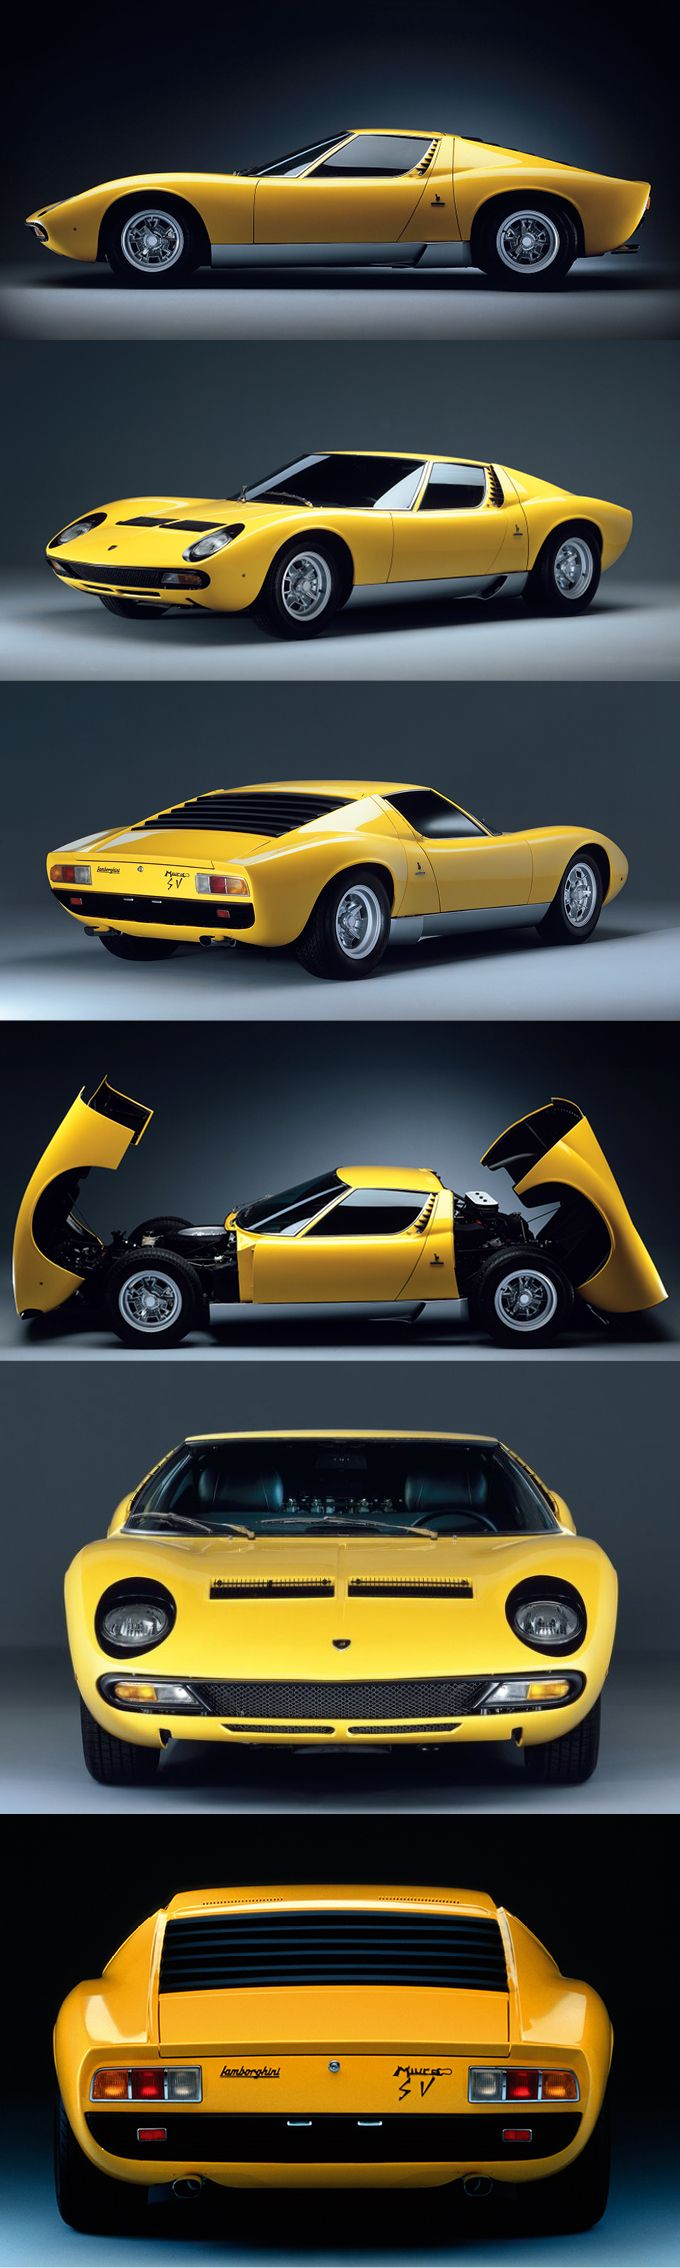 1971 Lamborghini Miura LP400 SV / 380hp V12 / Italy / yellow